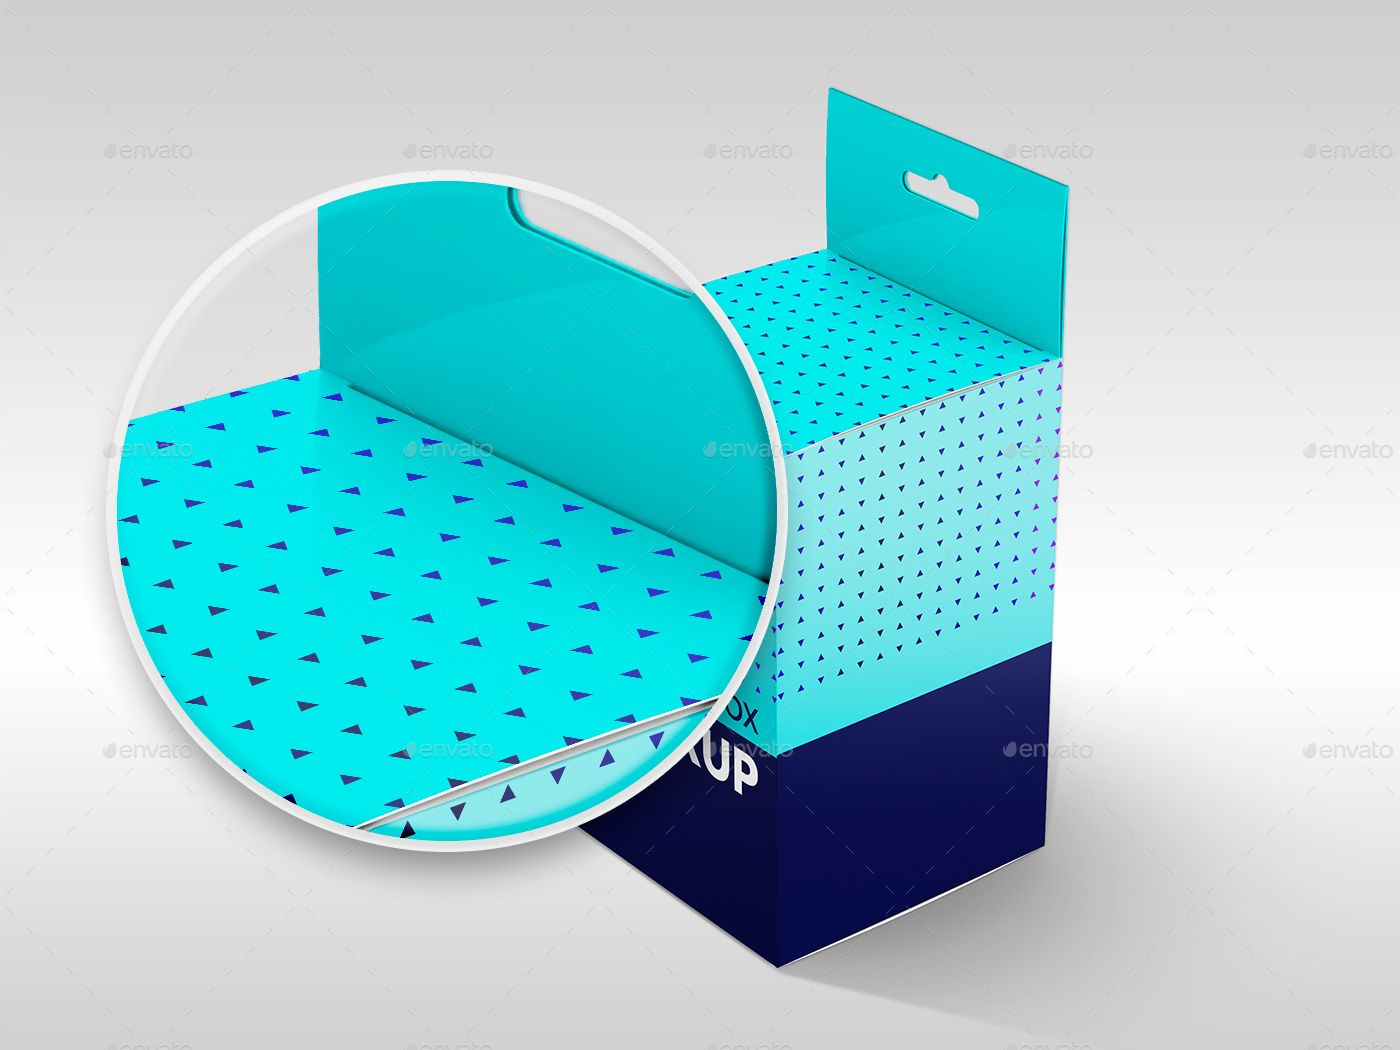 Download Hanging Square Box Mockups V 2 Square Hanging Mockups Box Box Mockup Box Packaging Design Graphic Design Layouts